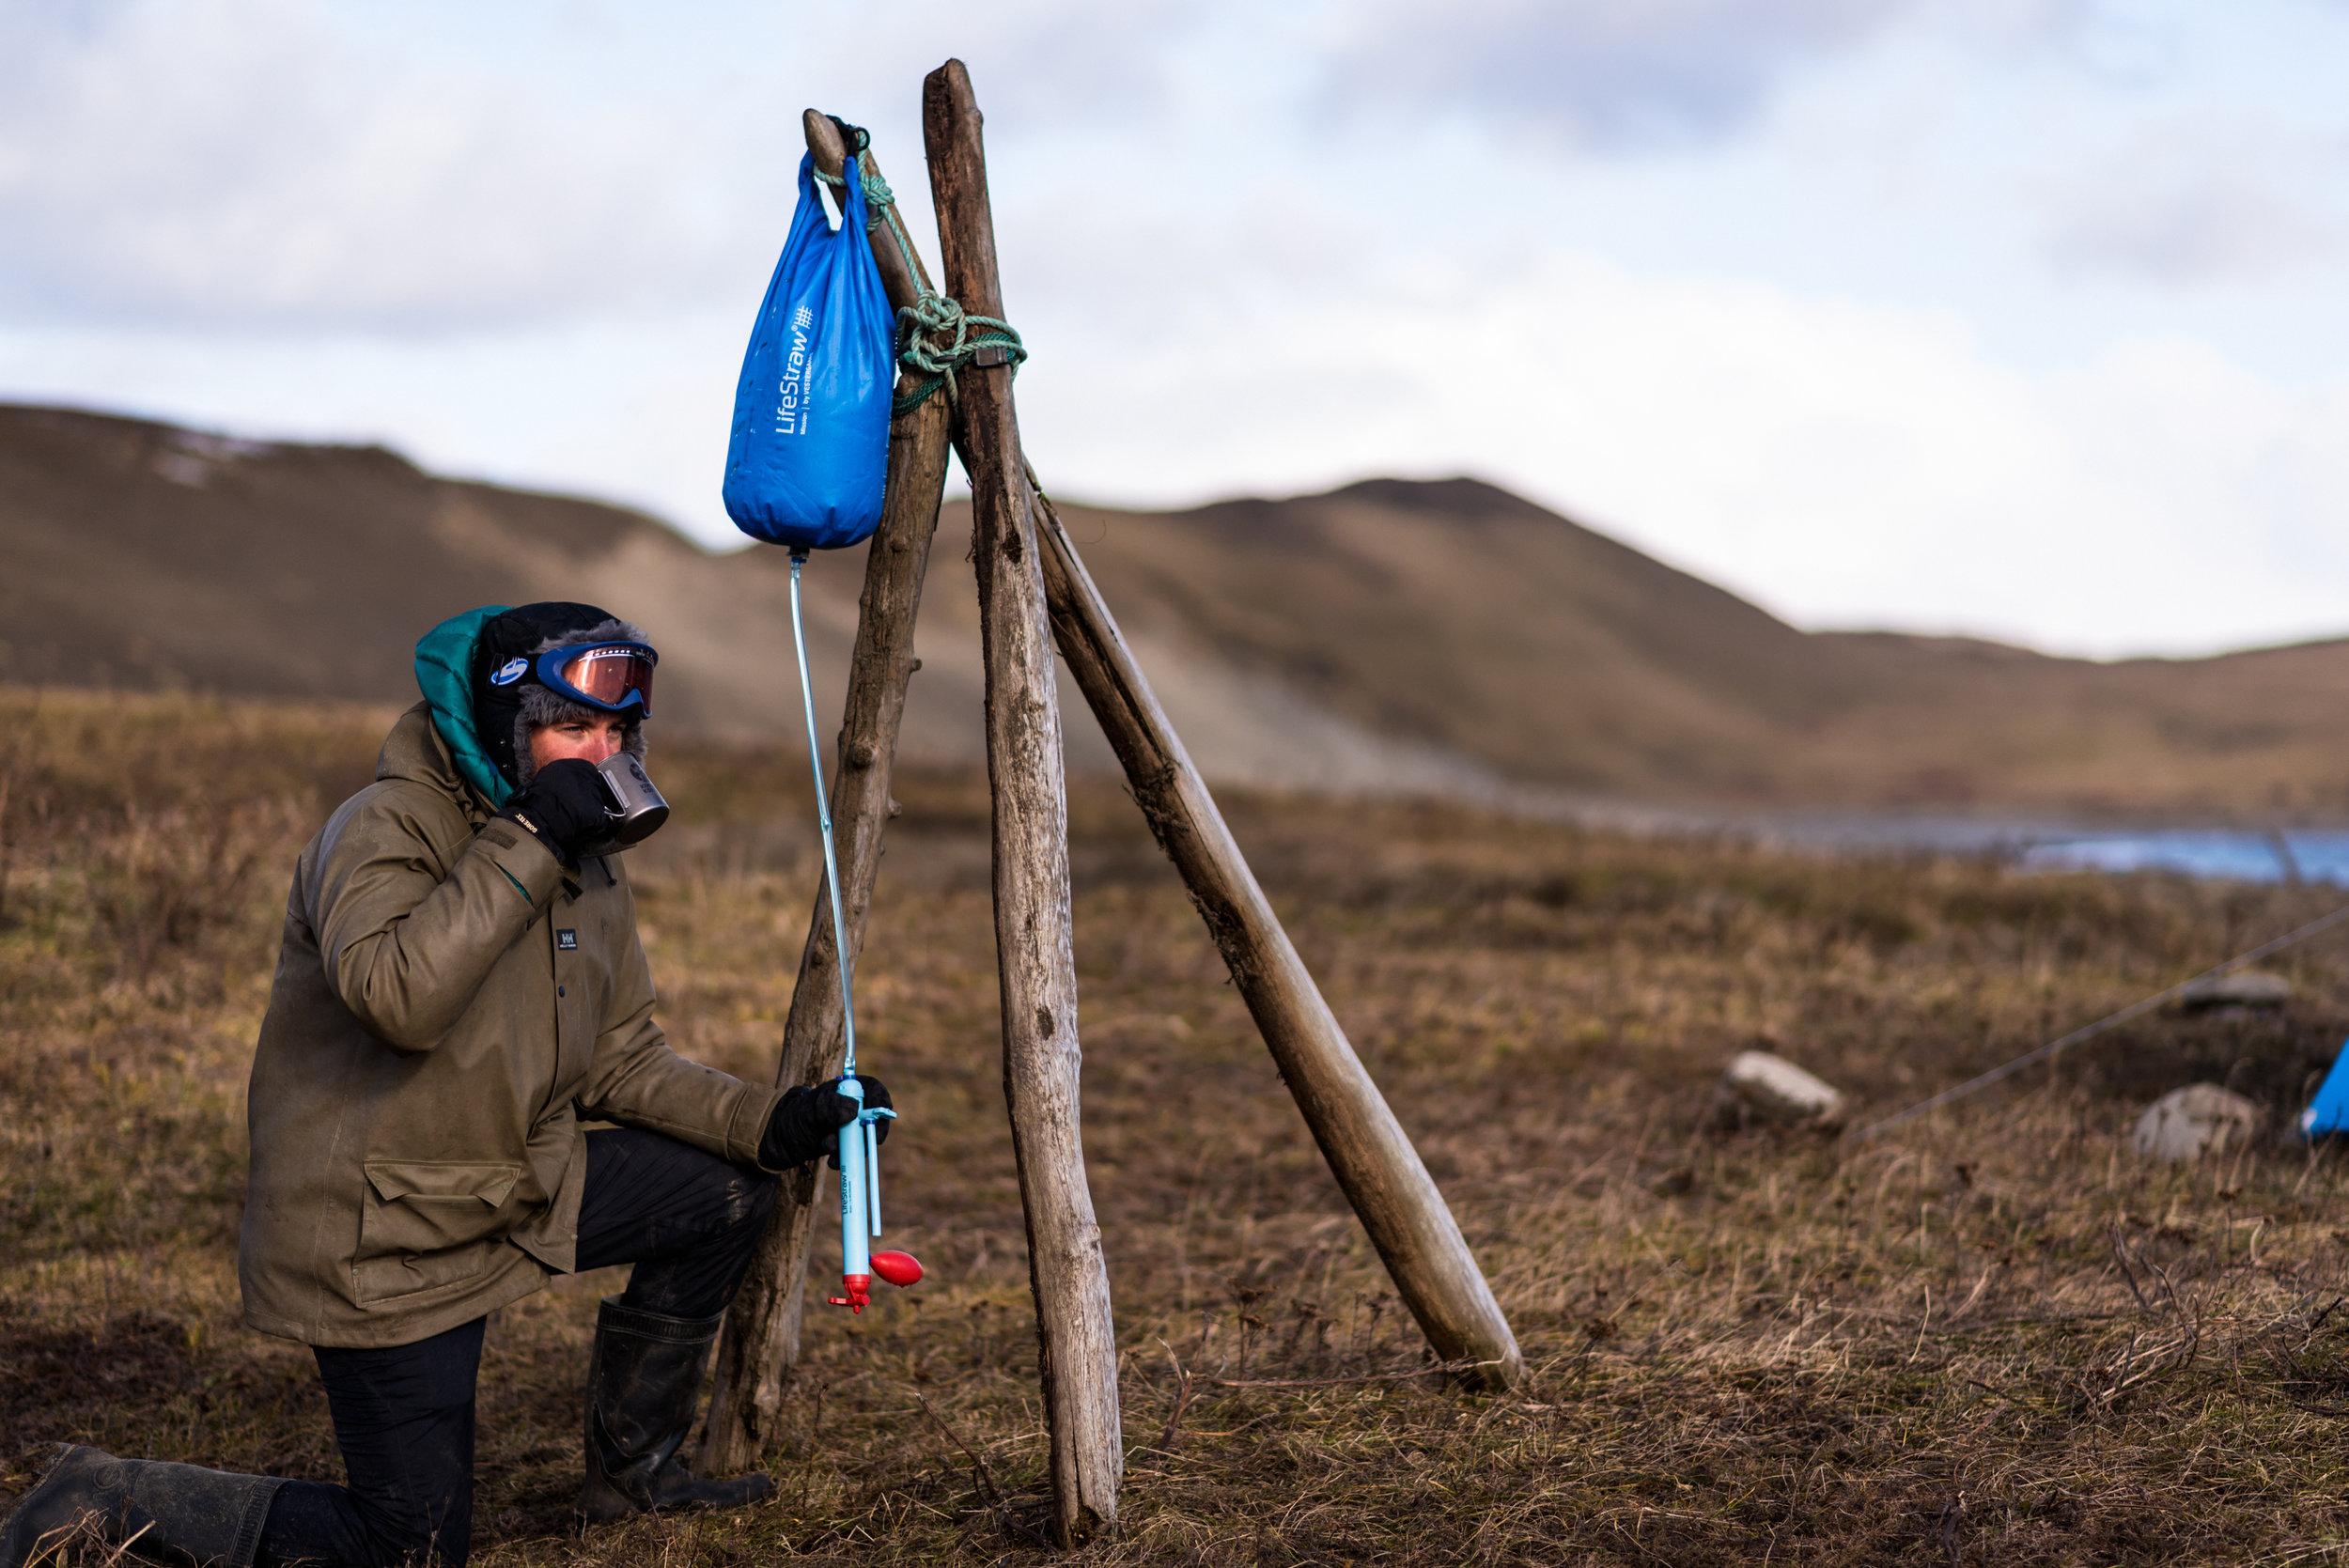 AleutianIslands-ChrisBrinleeJr-NOV16-D750-109.jpg